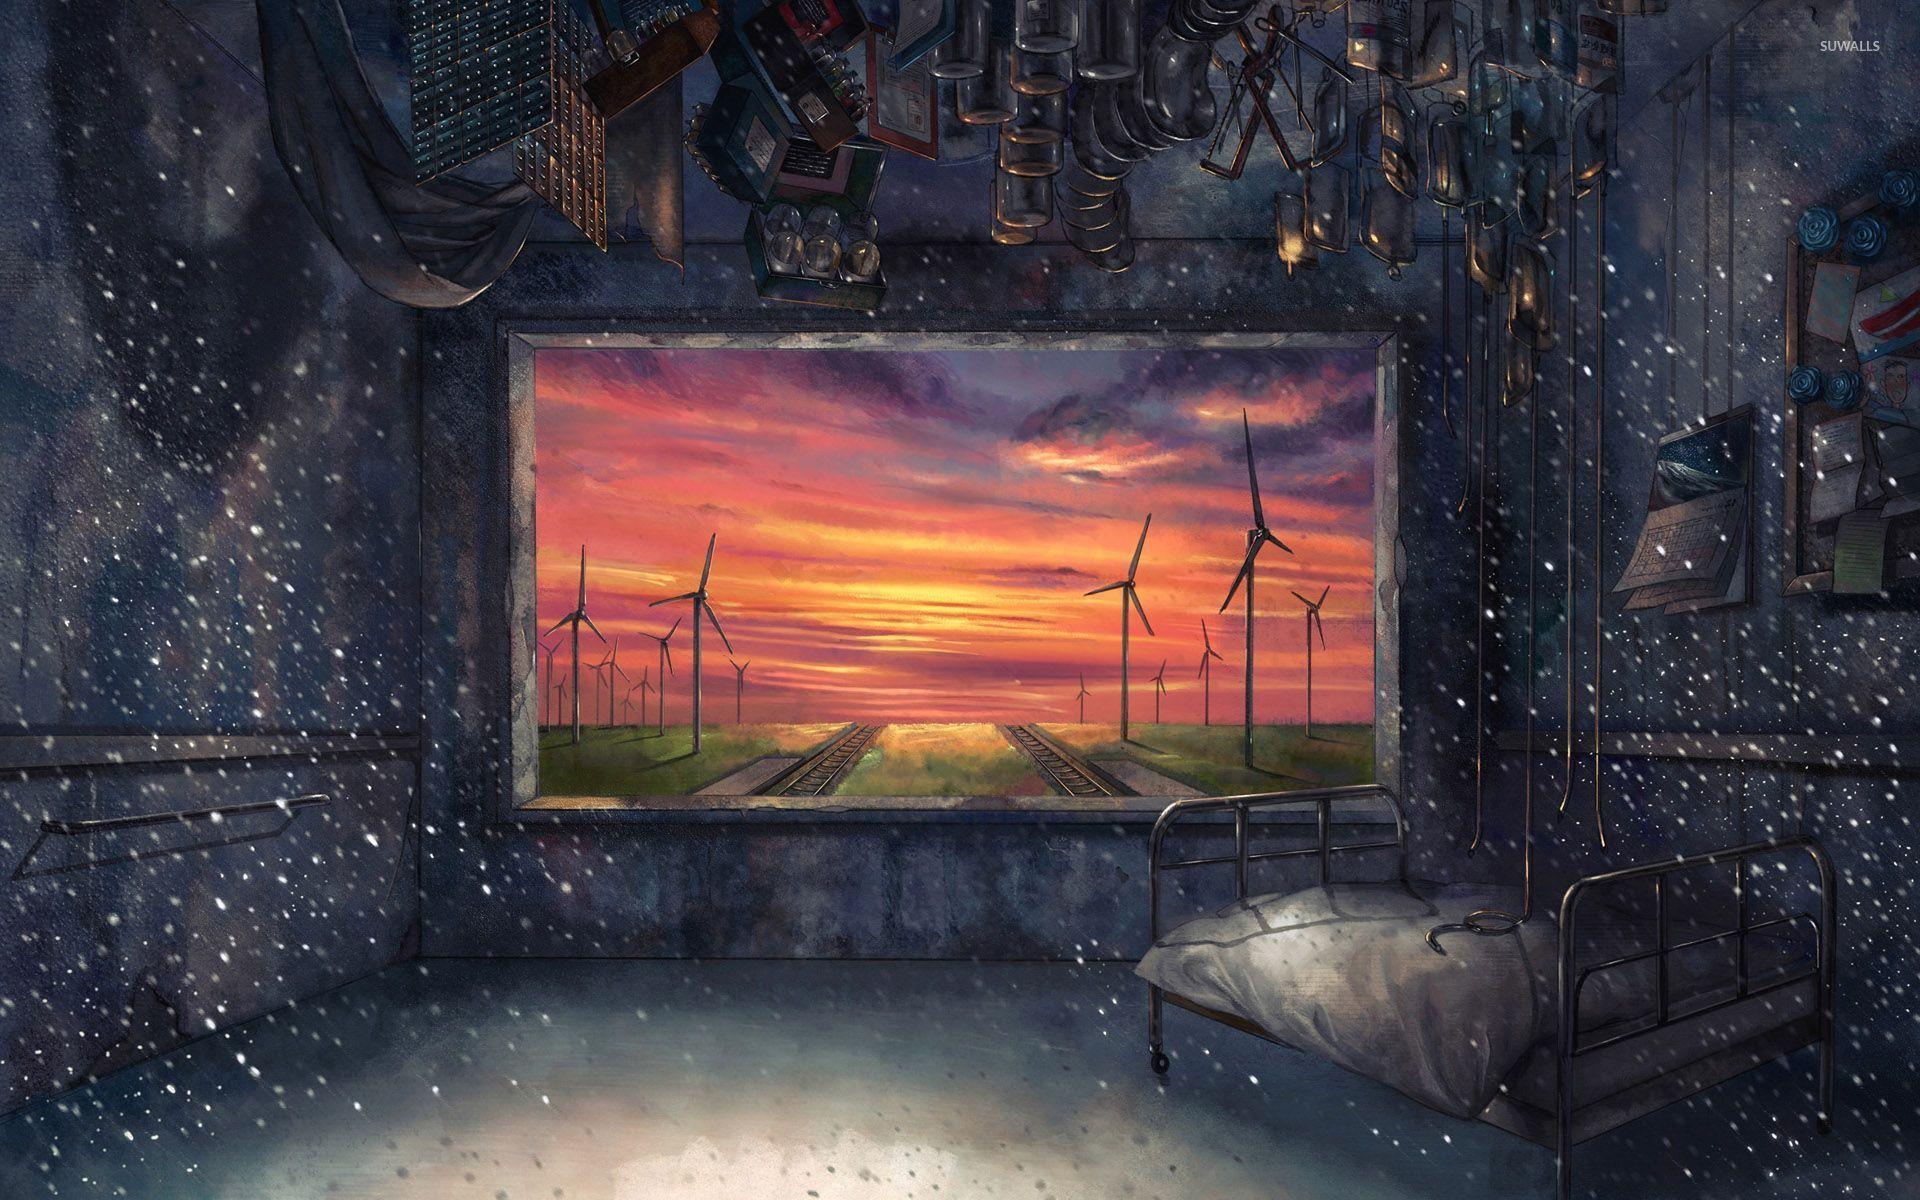 Prison like room wallpaper   Anime wallpapers   30766 1920x1200